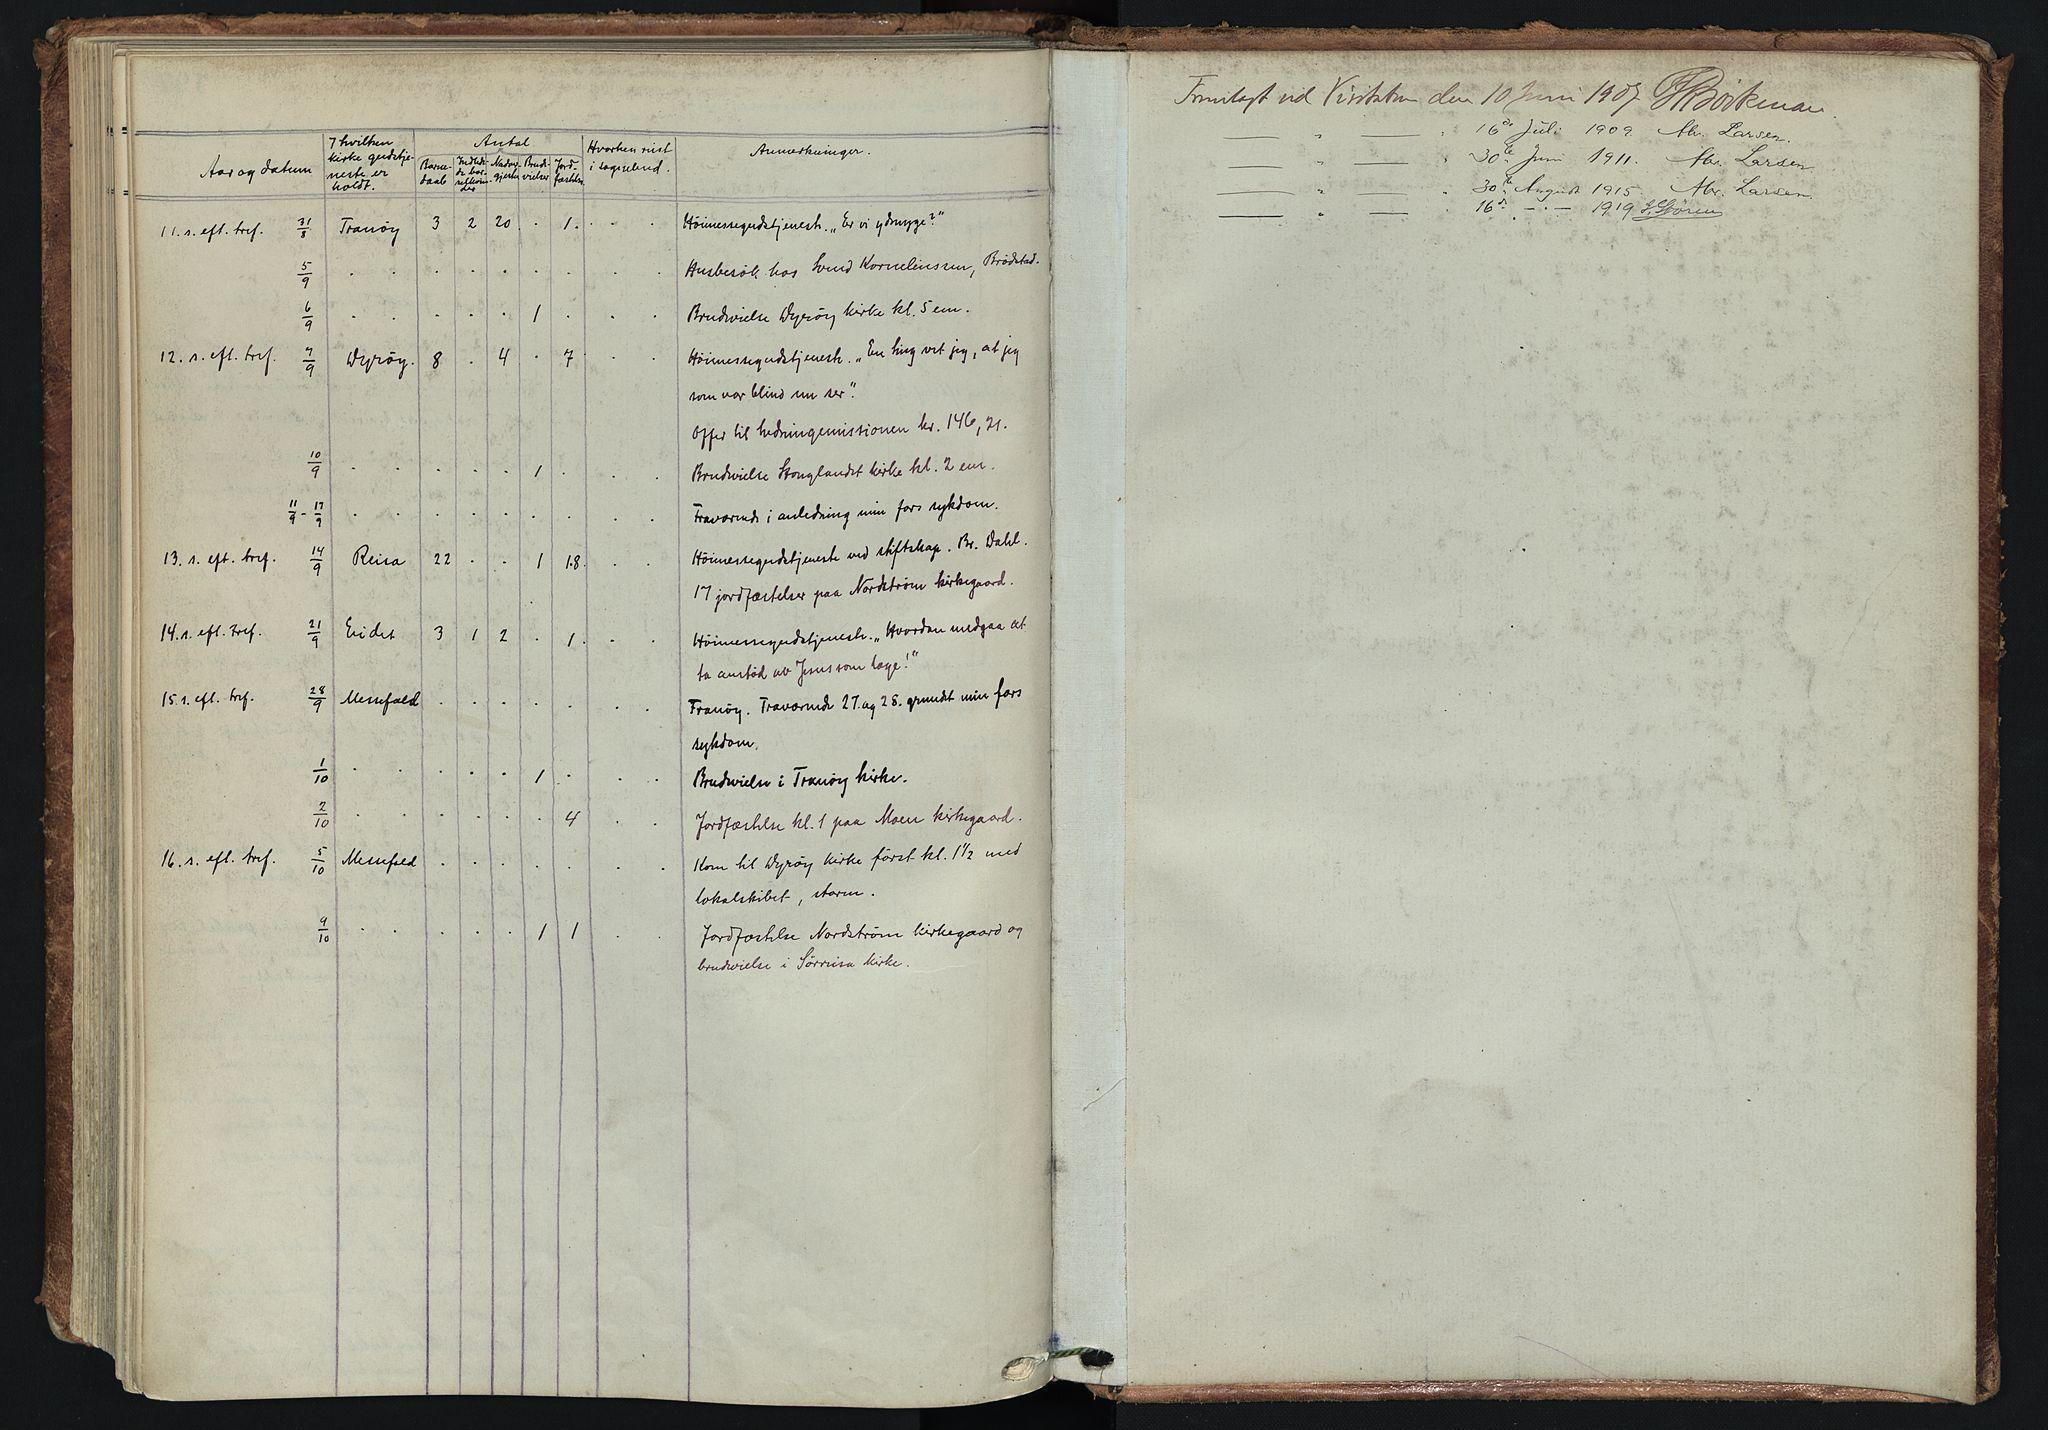 SATØ, Tranøy sokneprestkontor, I/Ia/Iaa/L0014kirke: Ministerialbok nr. 14, 1905-1919